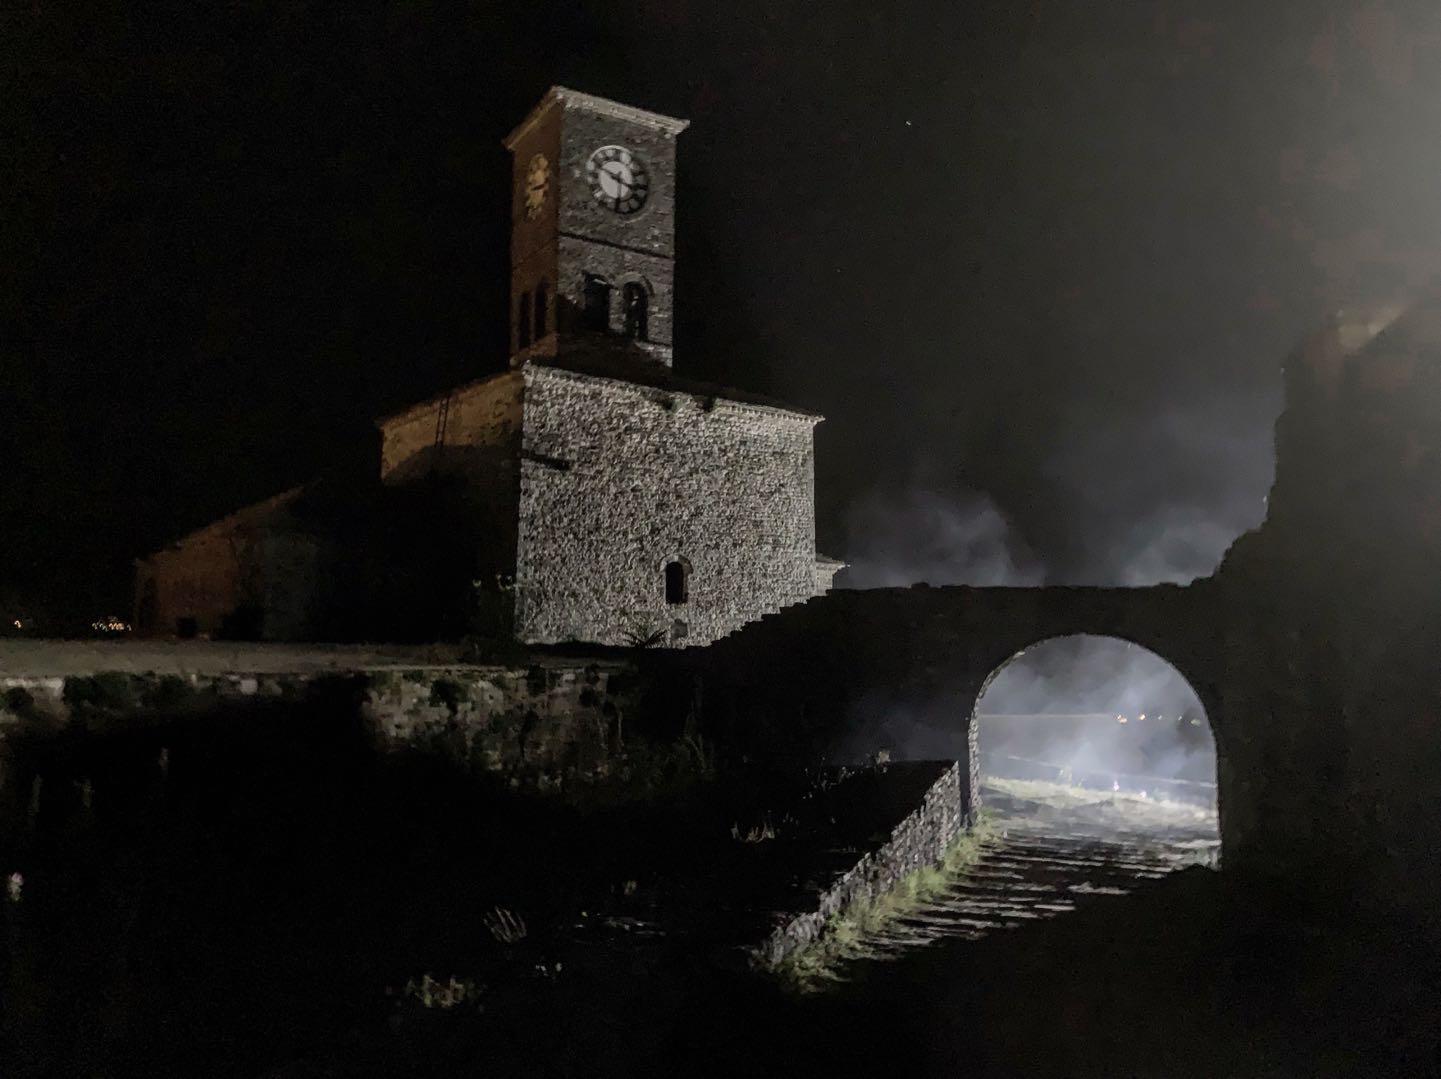 Explaining the Albania Part to Castle Freak